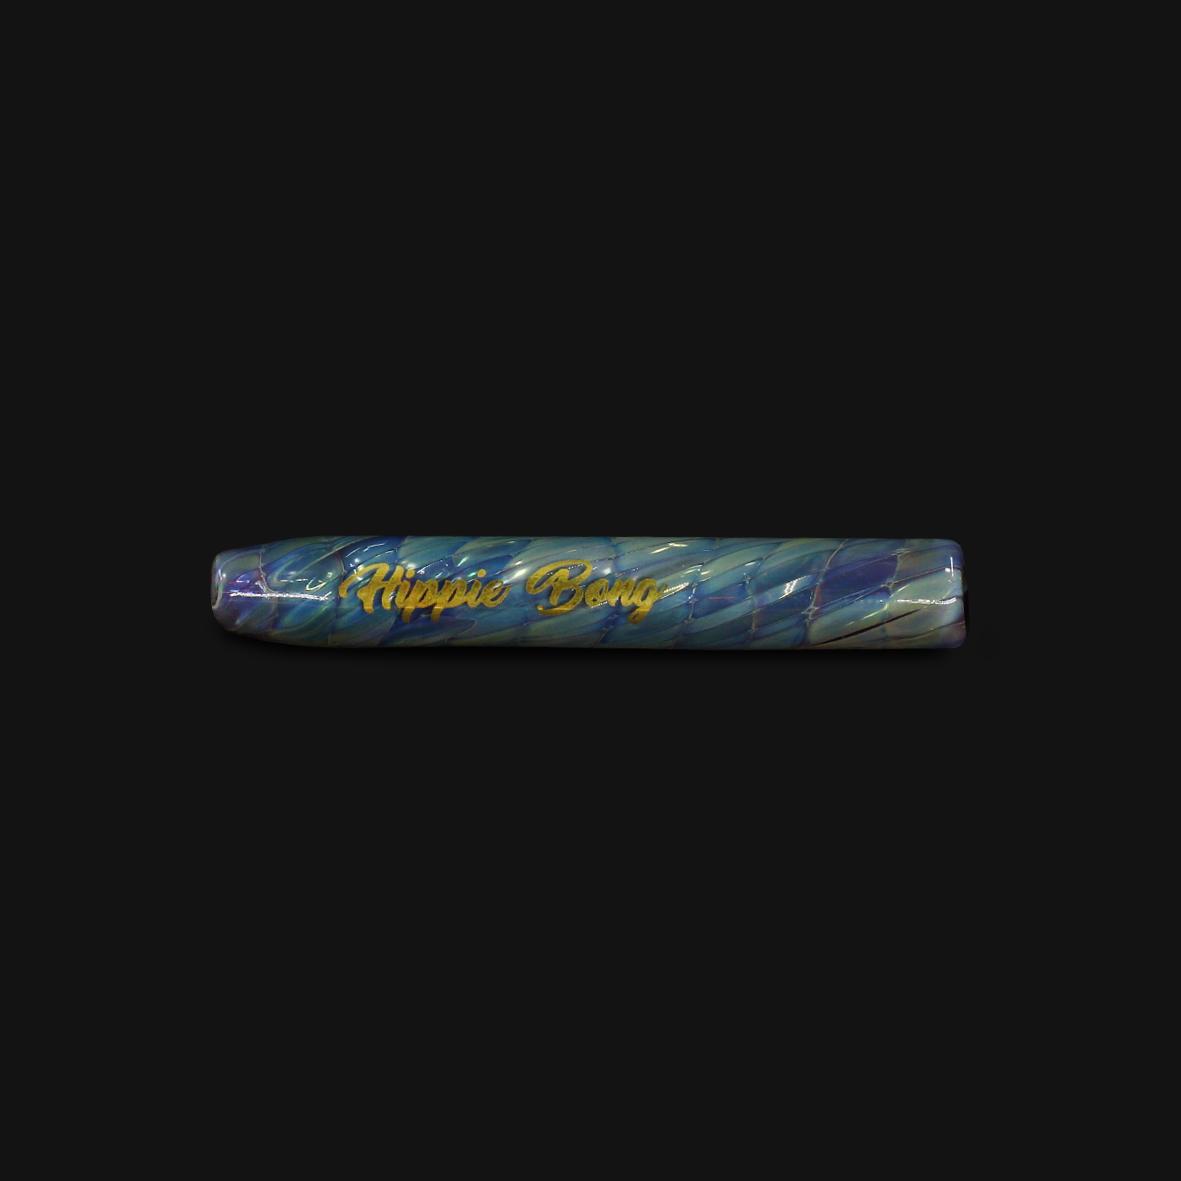 Piteira de vidro Dragon Scale 2 #05